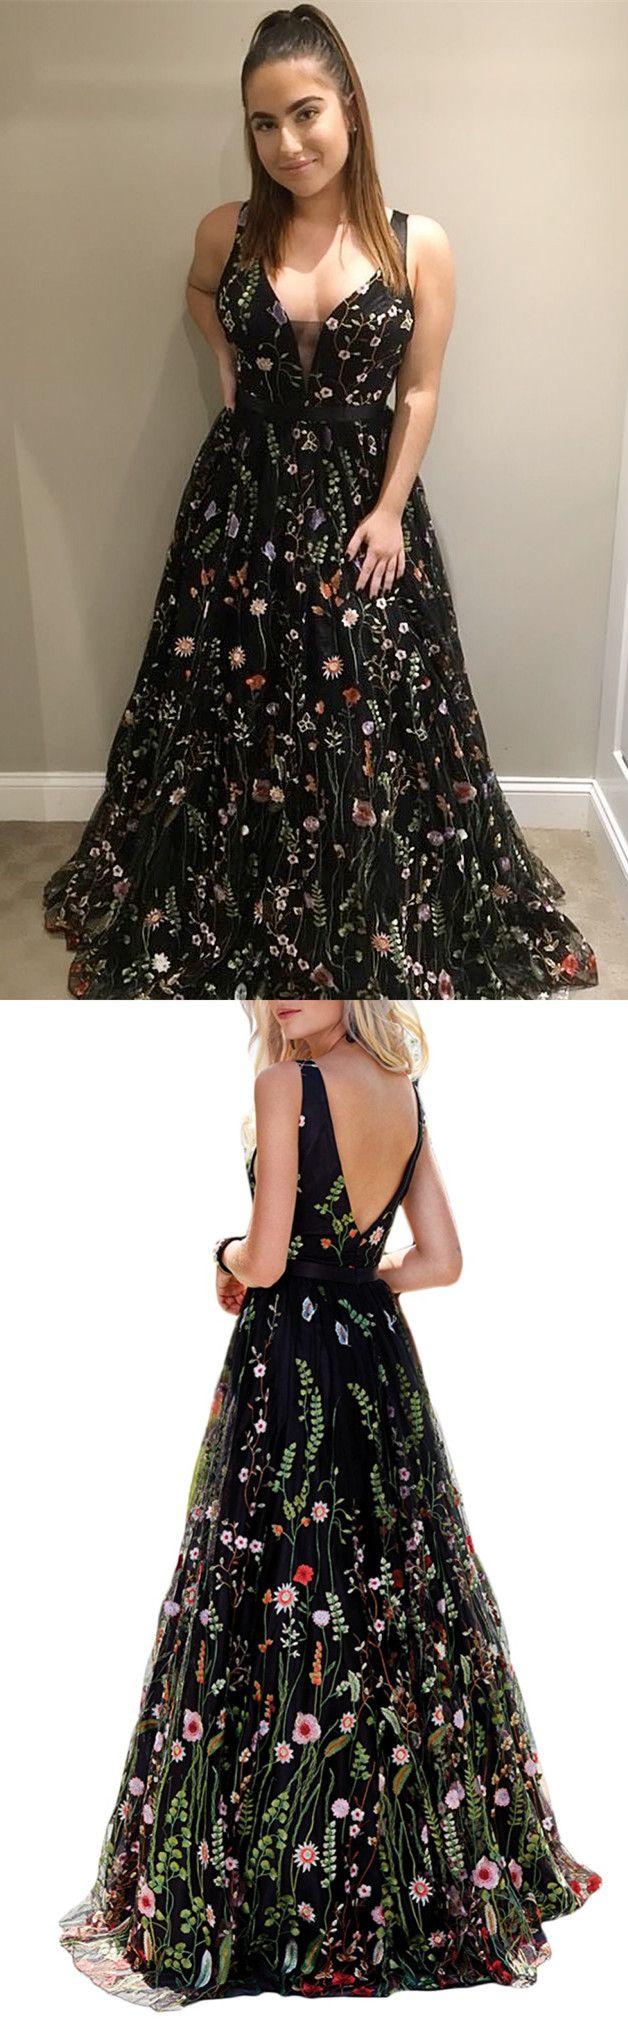 Priness straps black floral long prom dress prom dress